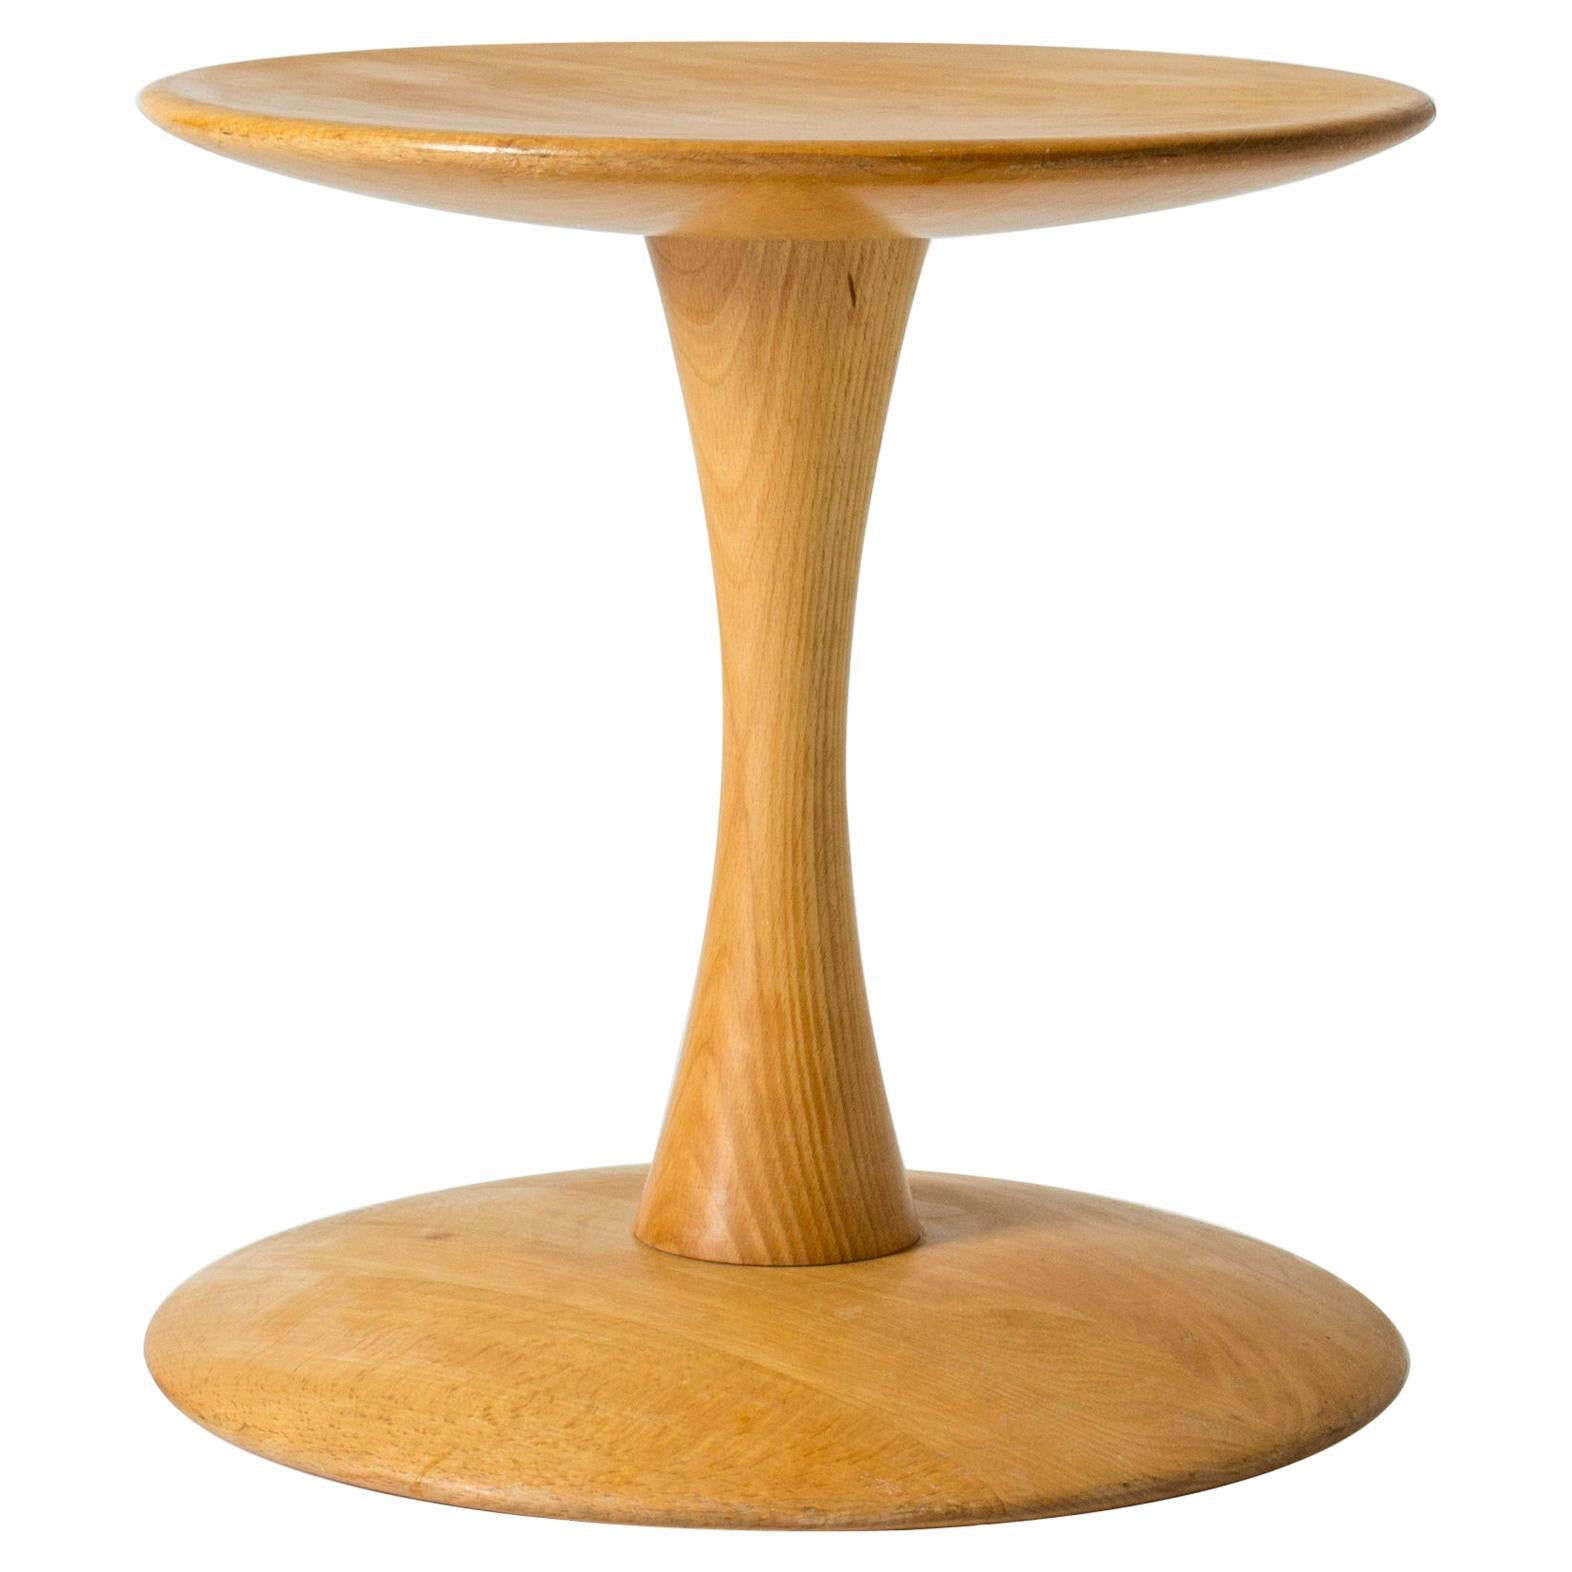 "Beech Stool/Table ""Toadstool"", ""Trisserne"" by Nanna Ditzel for Kolds Savværk"